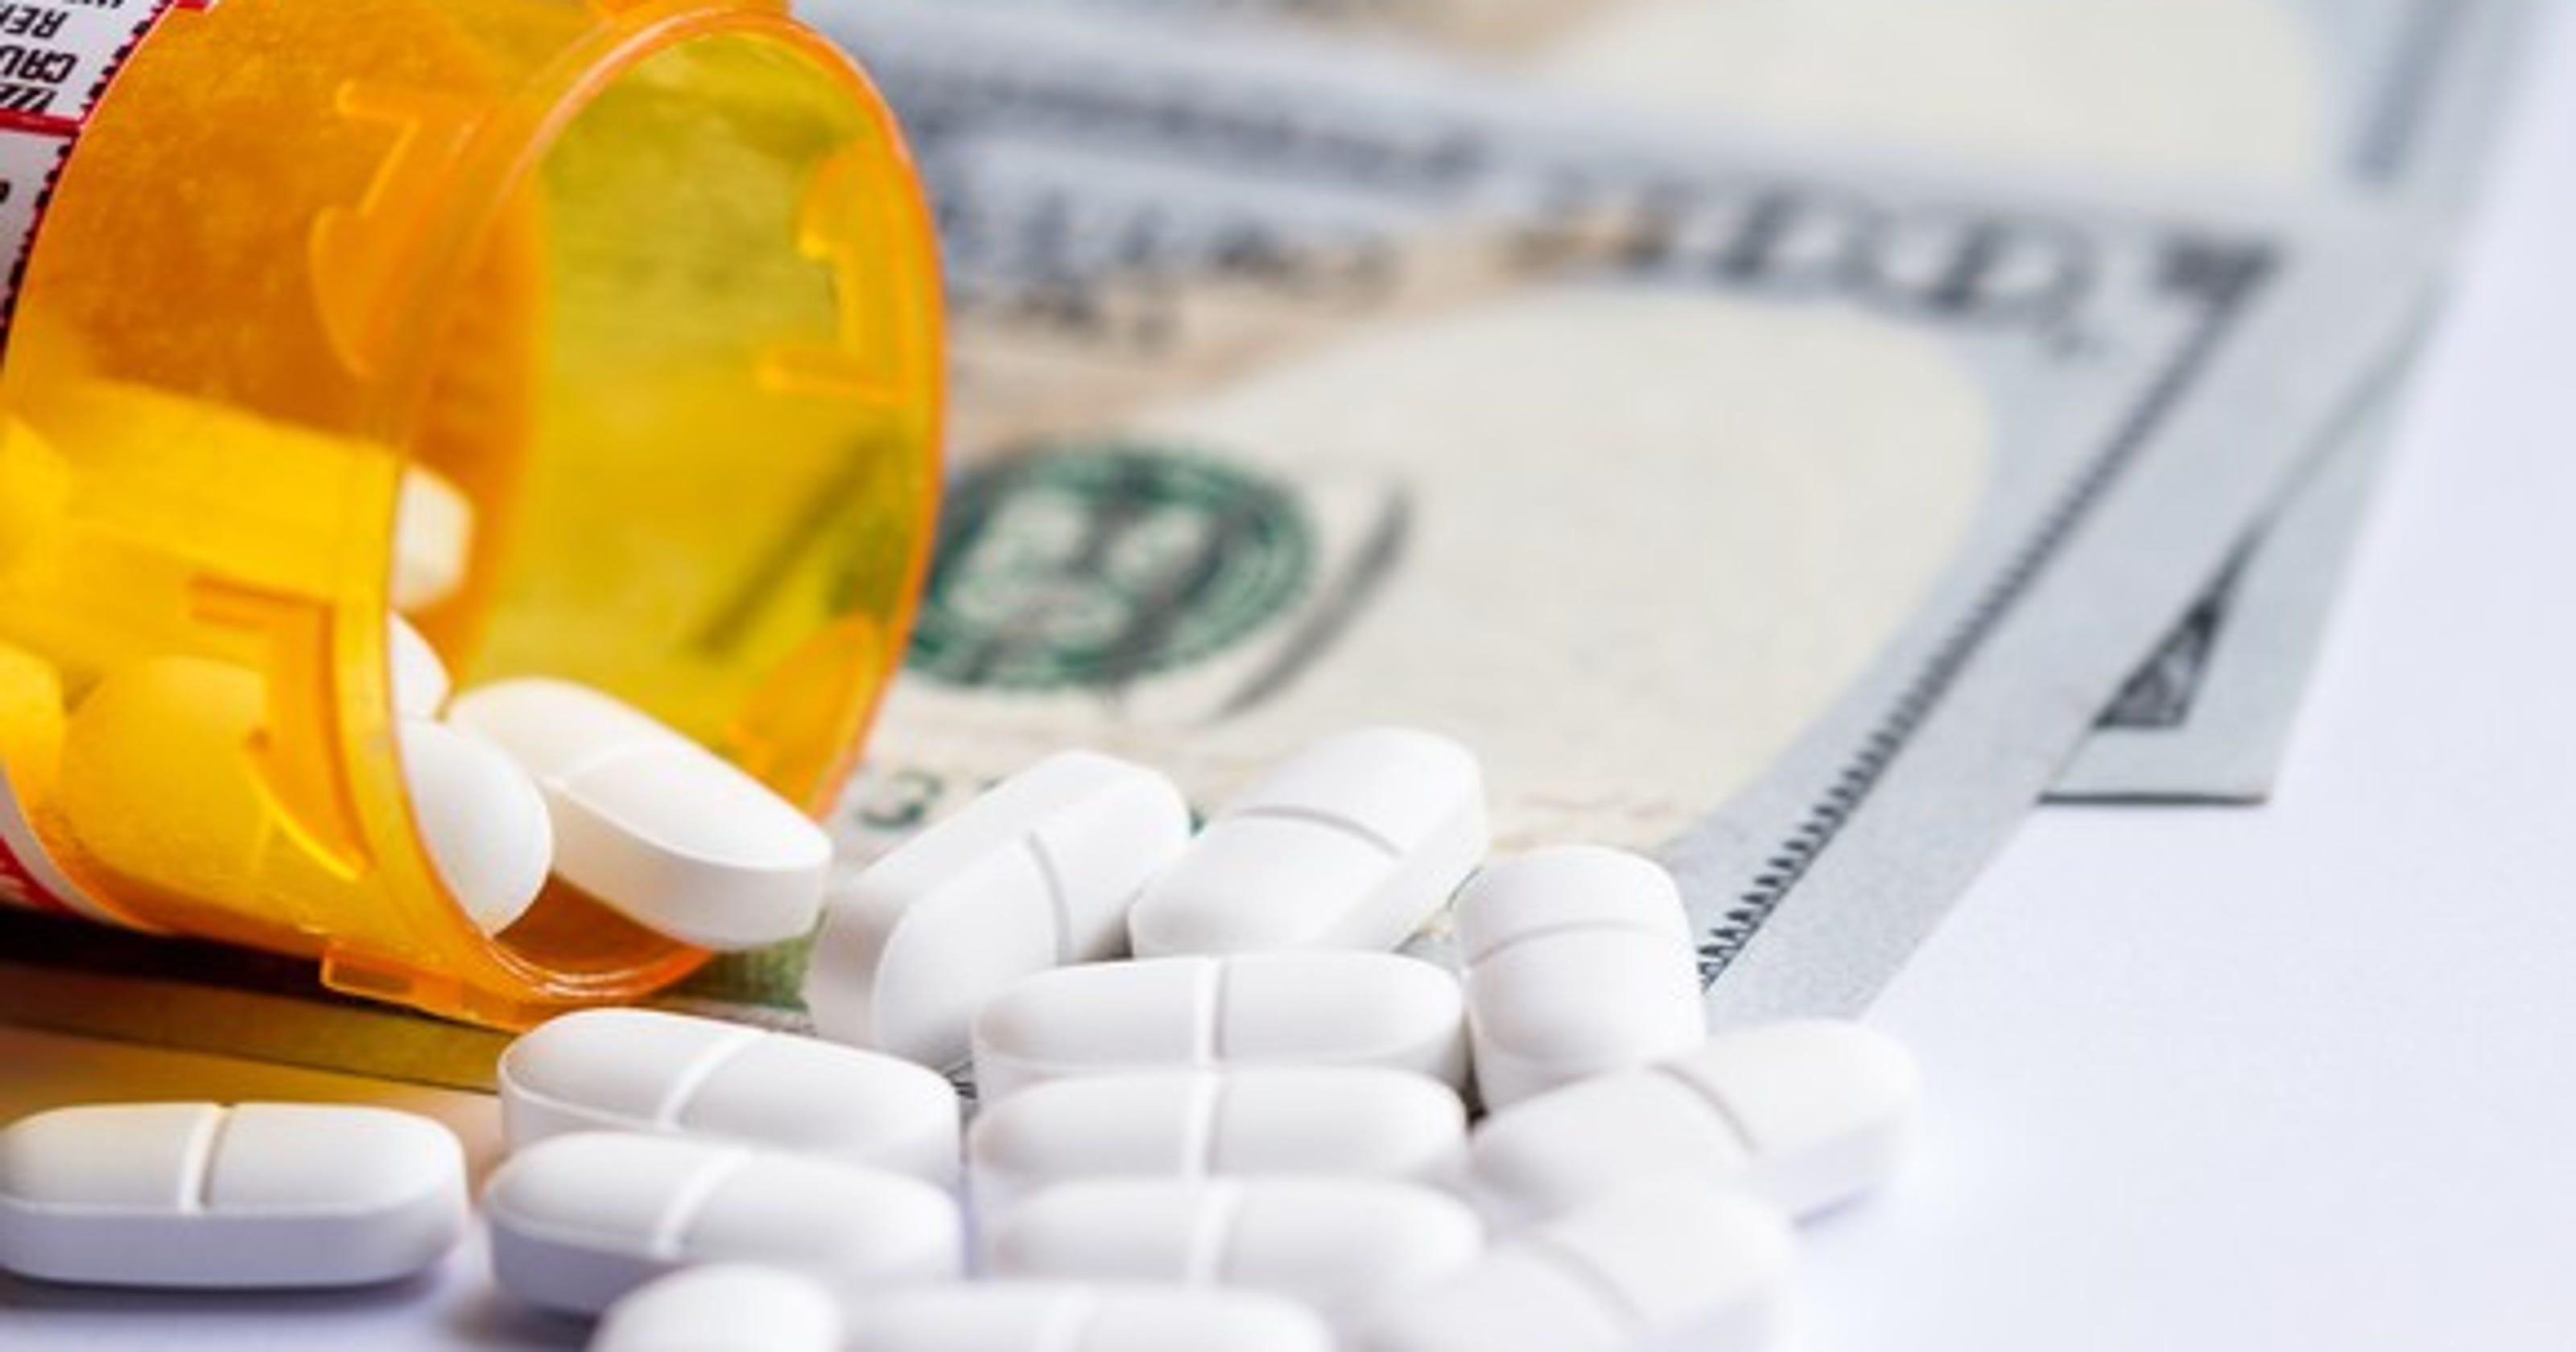 Blood pressure drug recall: FDA investigates plants that